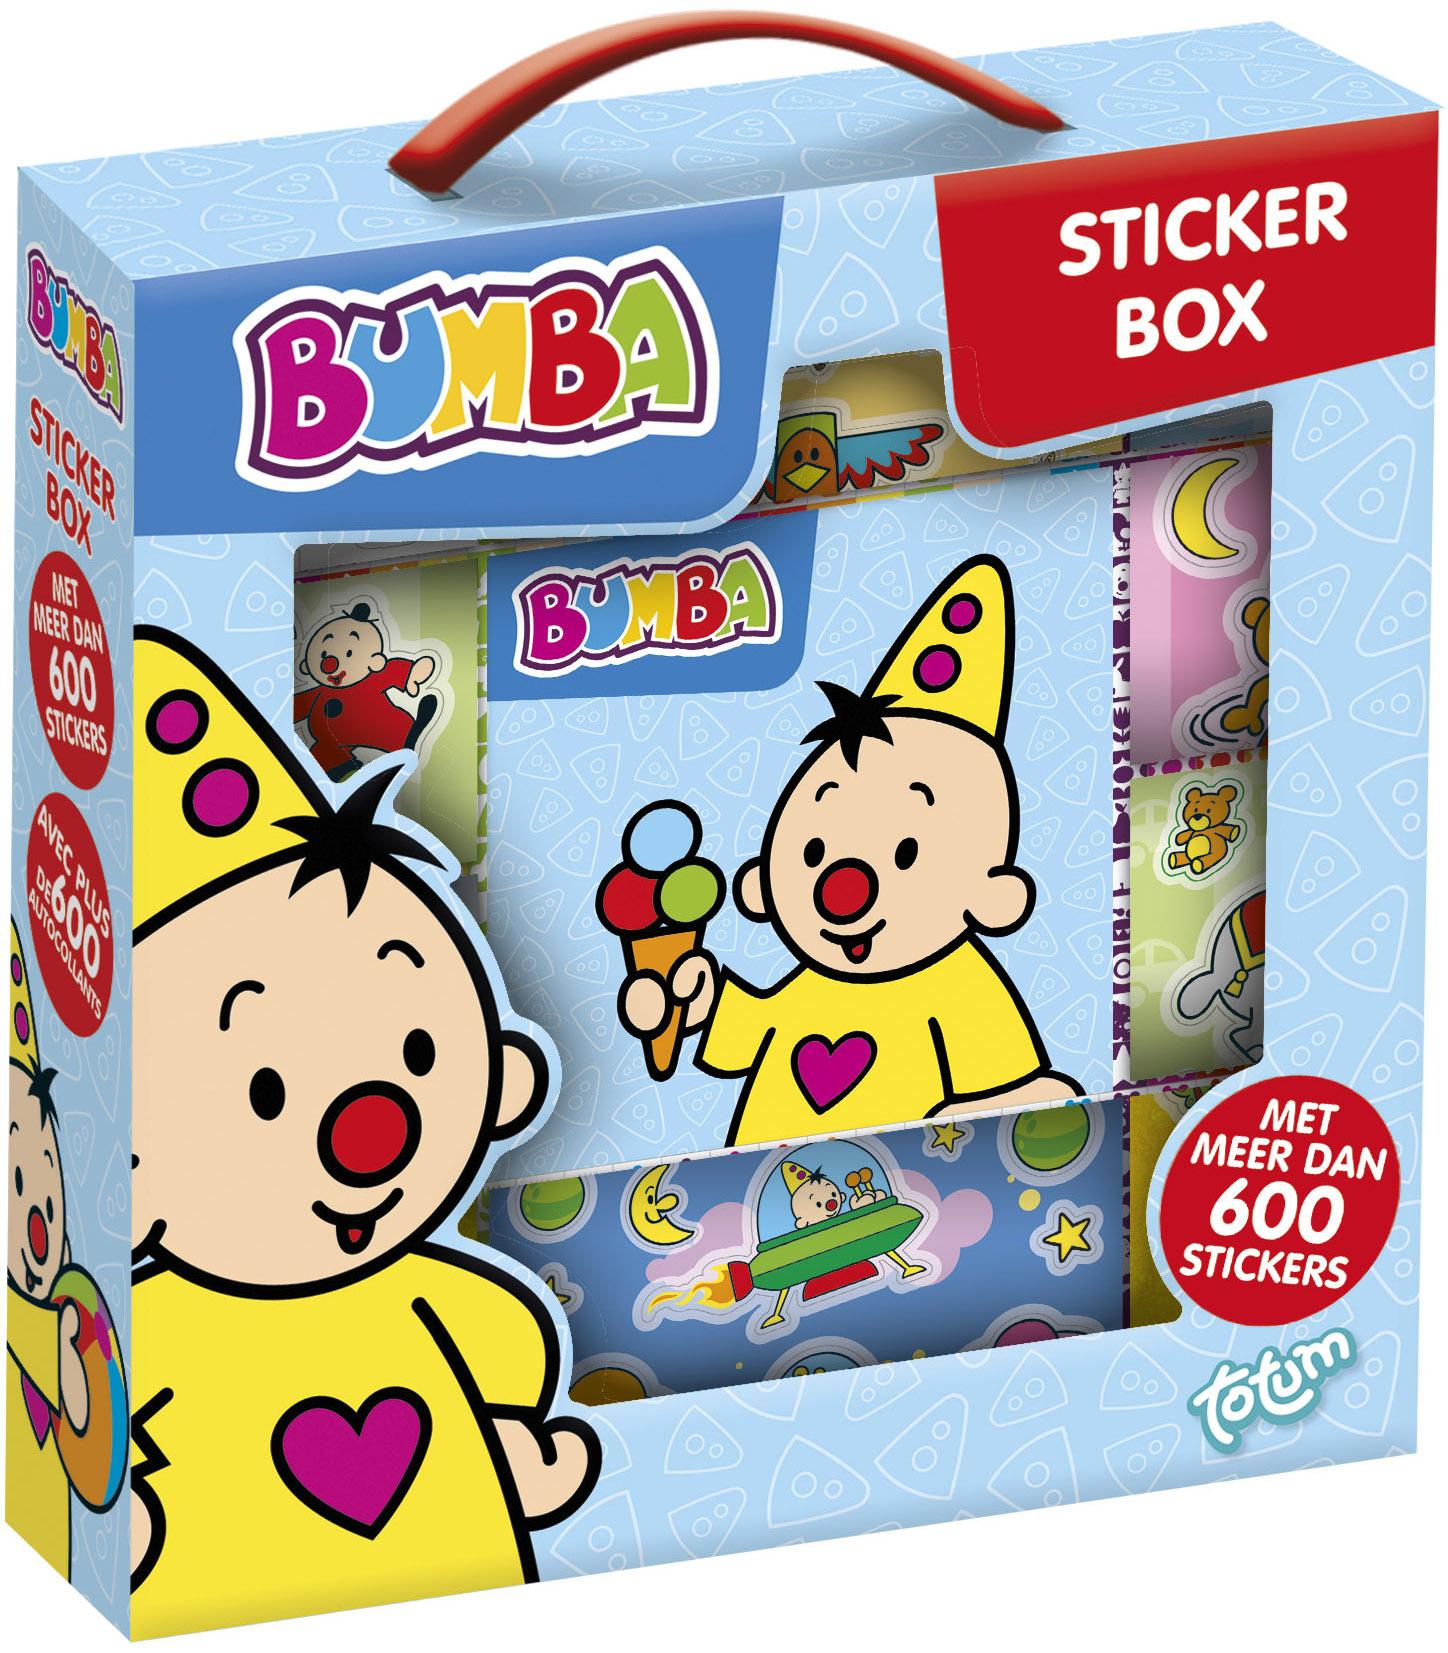 Sticker box Bumba ToTum 600+ stickers